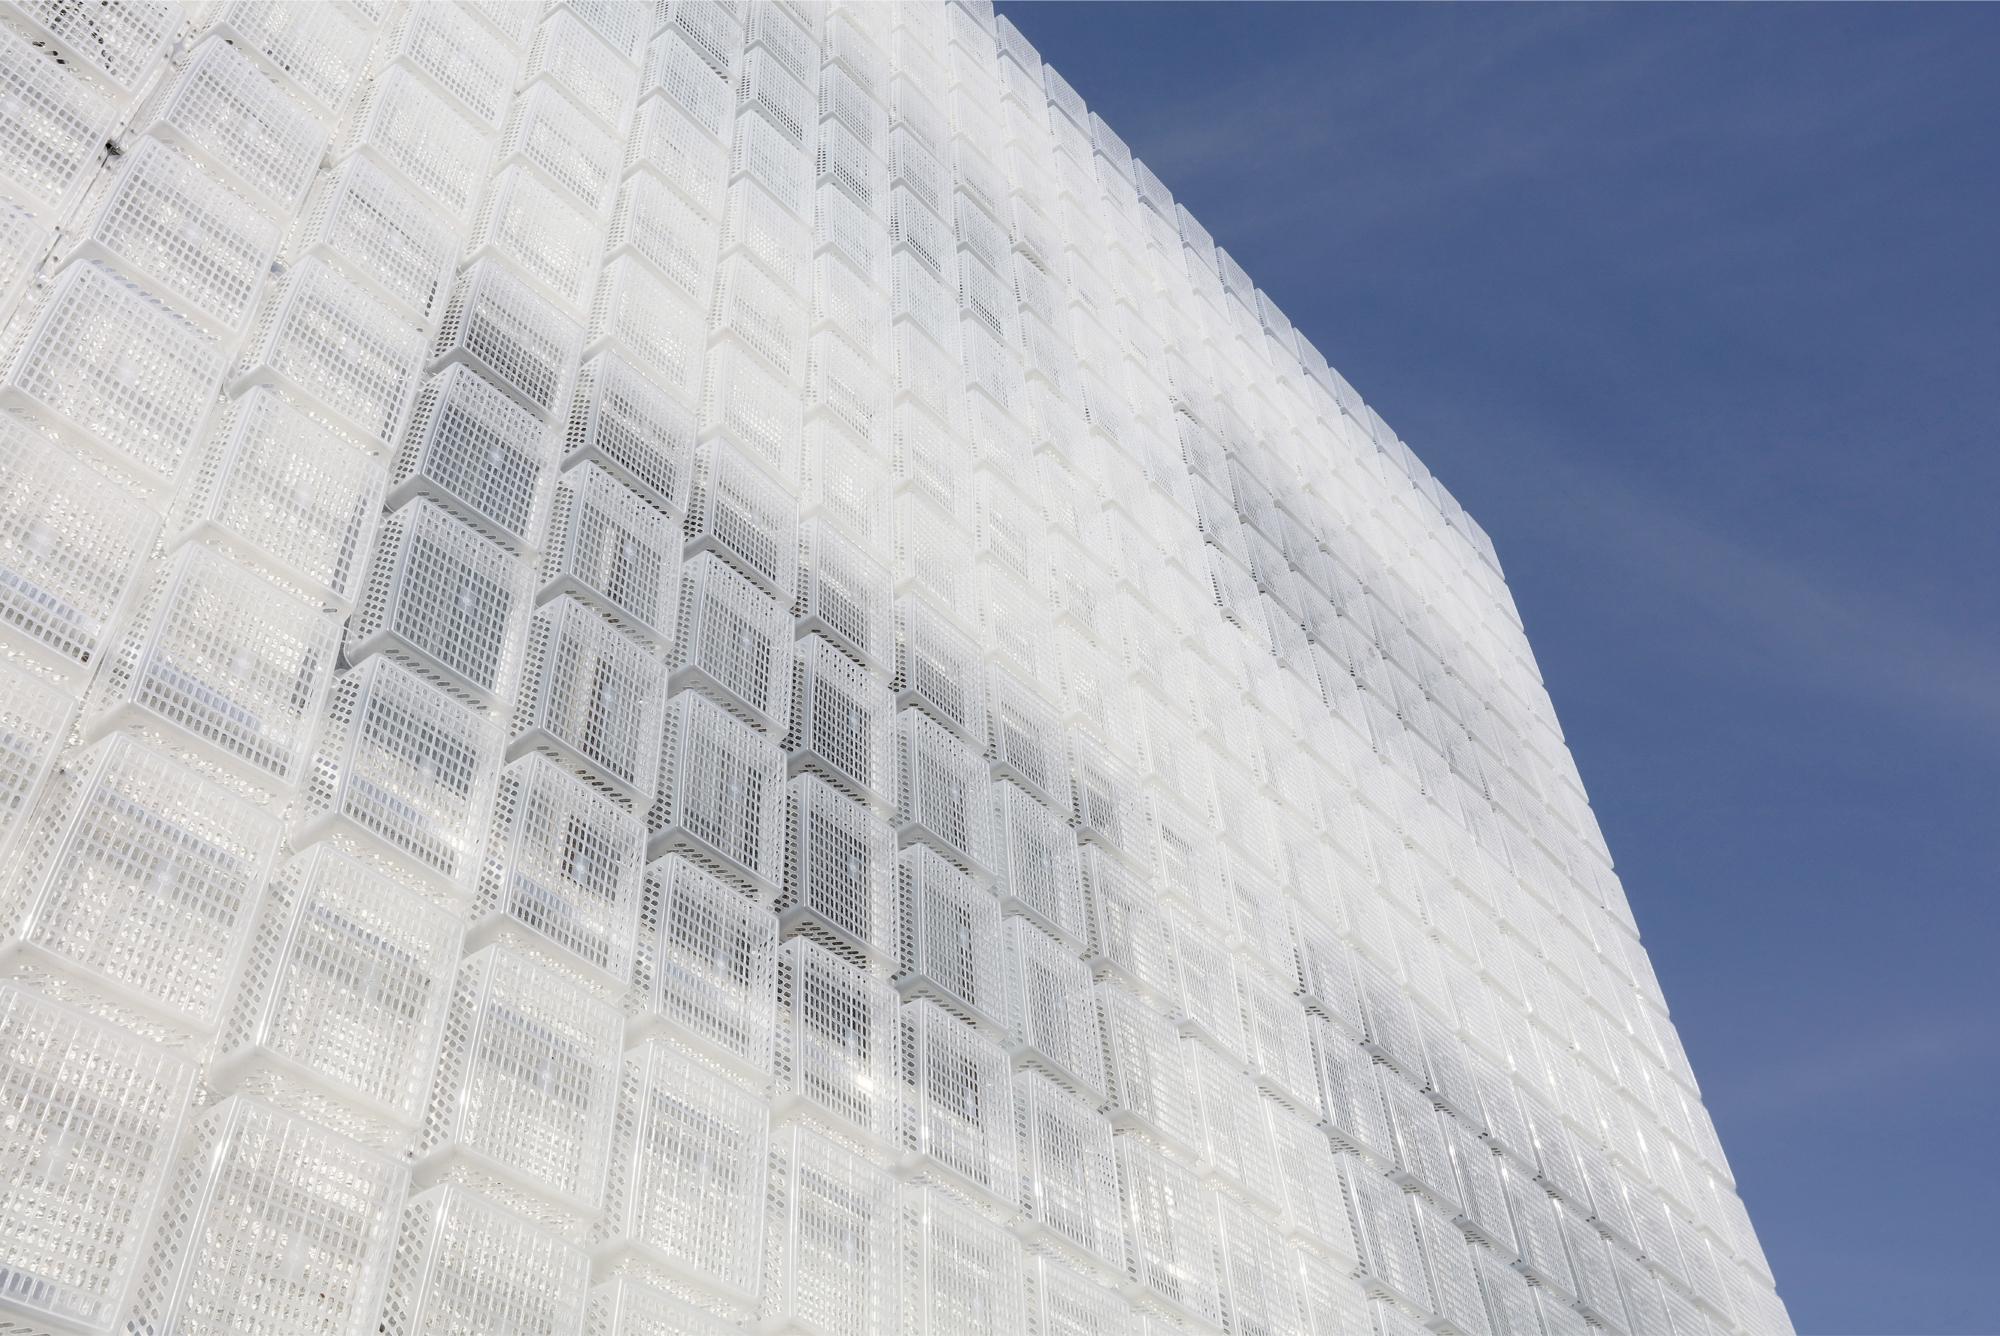 Facade: 1,500 Semi-Transparent Plastic Baskets Form A Lightweight